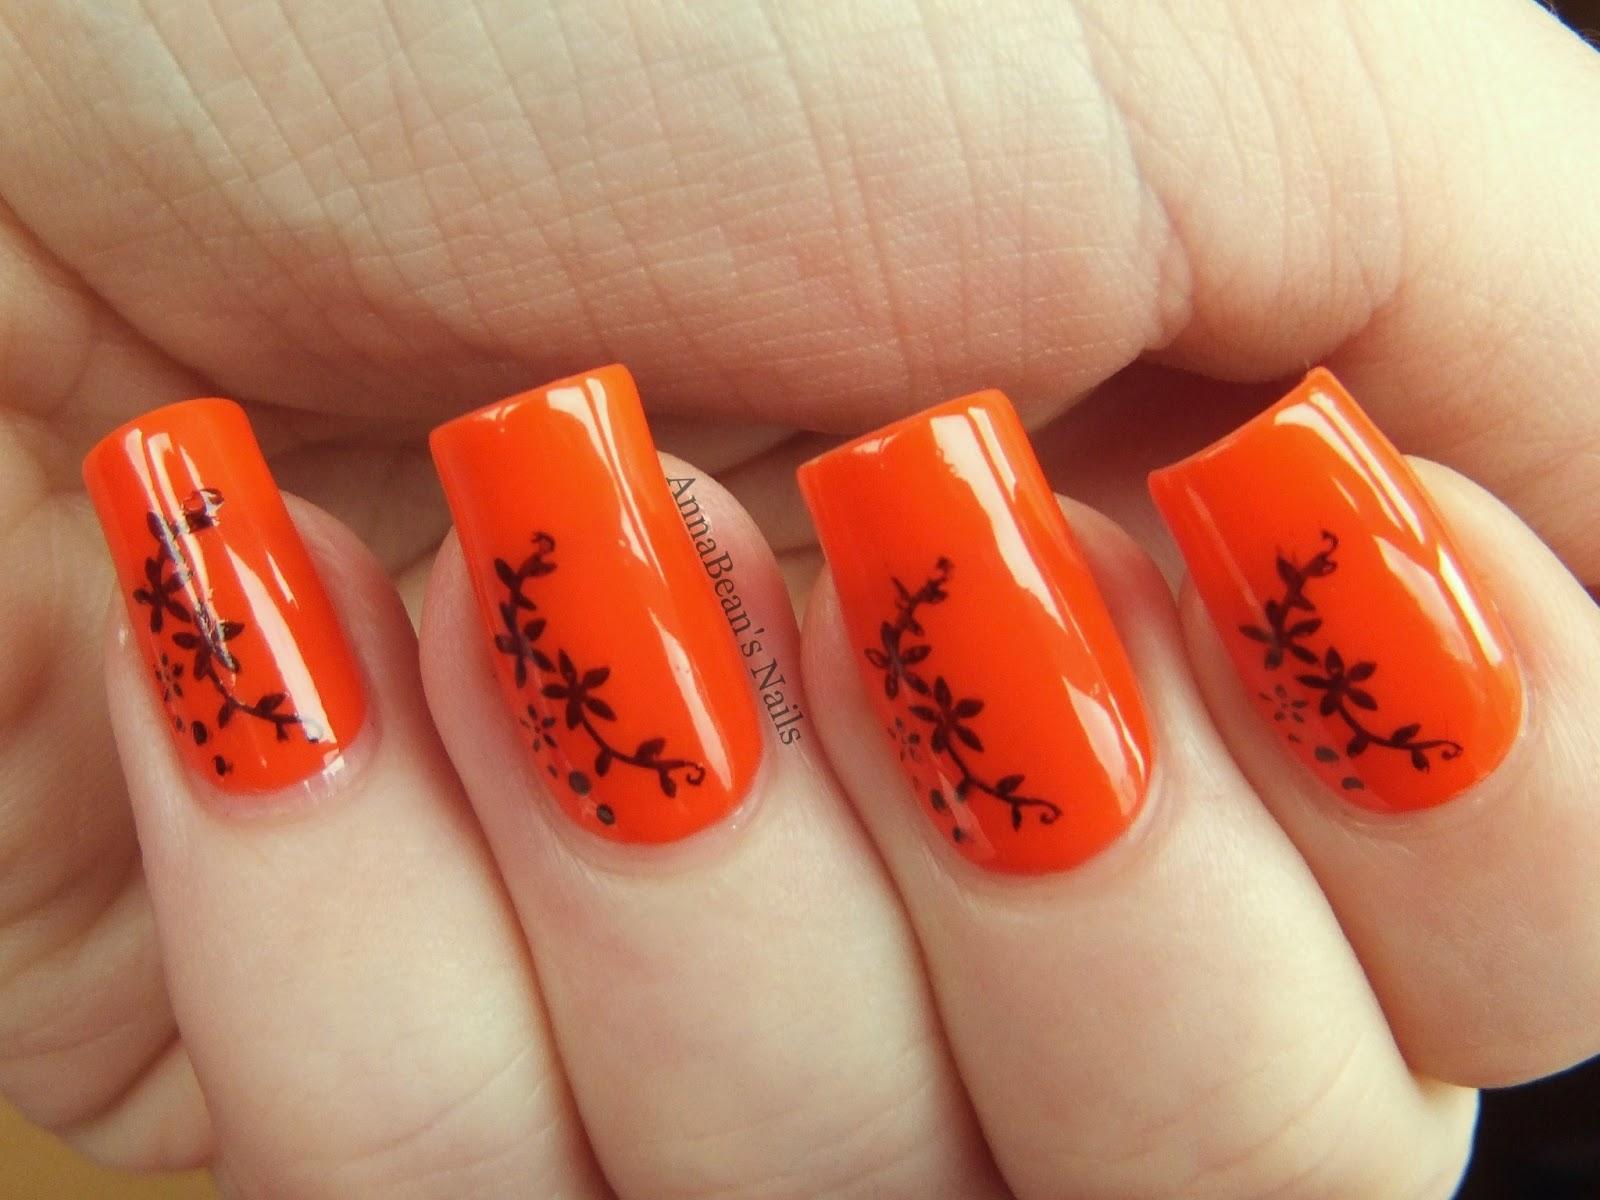 neon orange nails besides case asus zenfone laser 2 together with dope